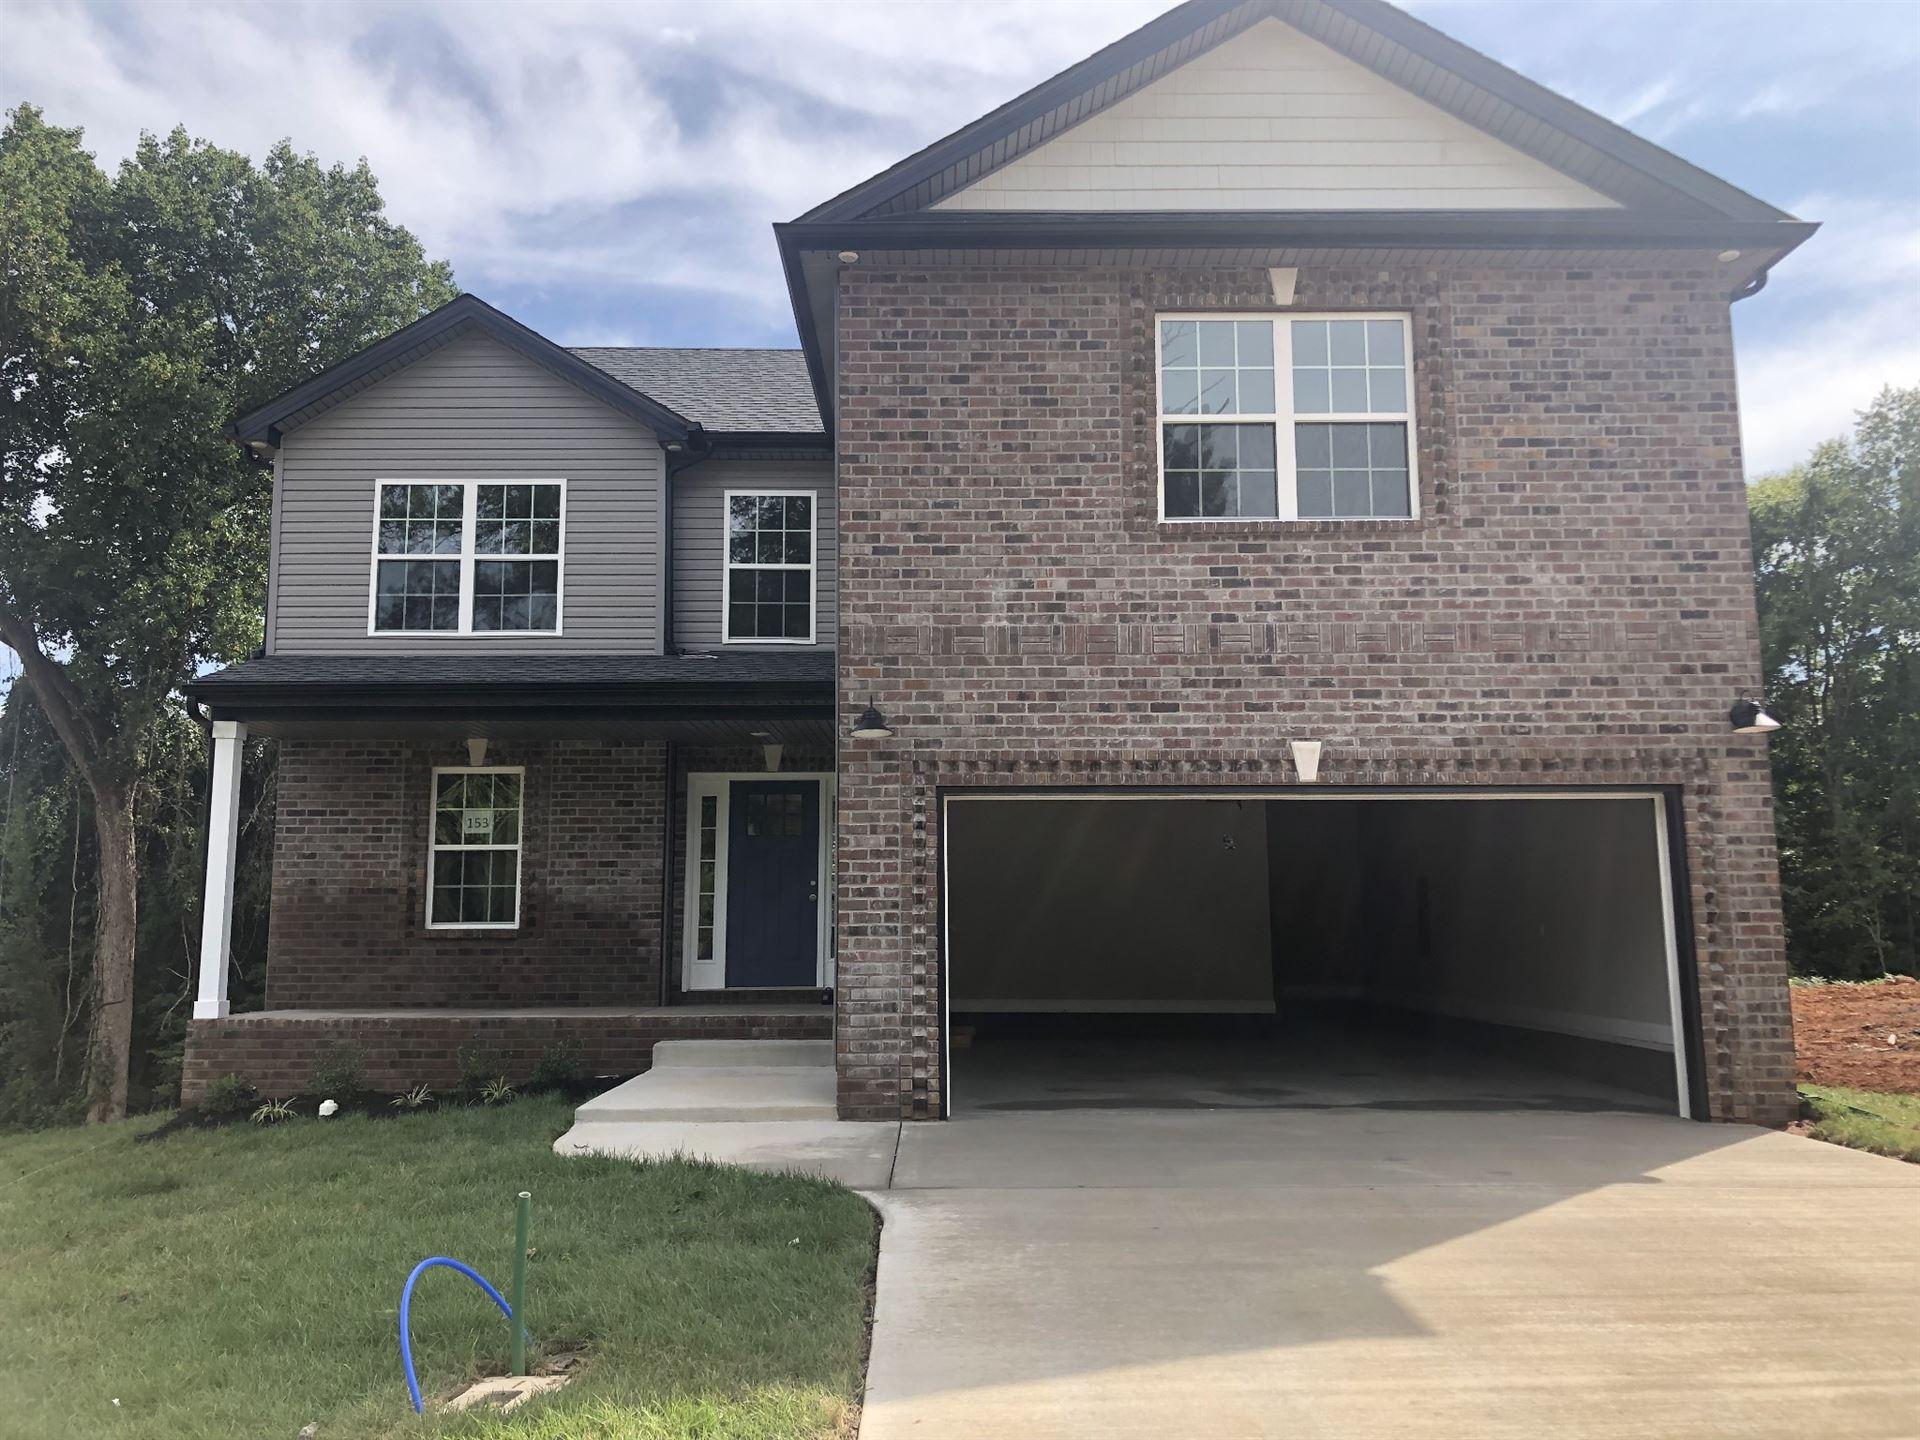 153 Glenstone, Clarksville, TN 37043 - MLS#: 2250434